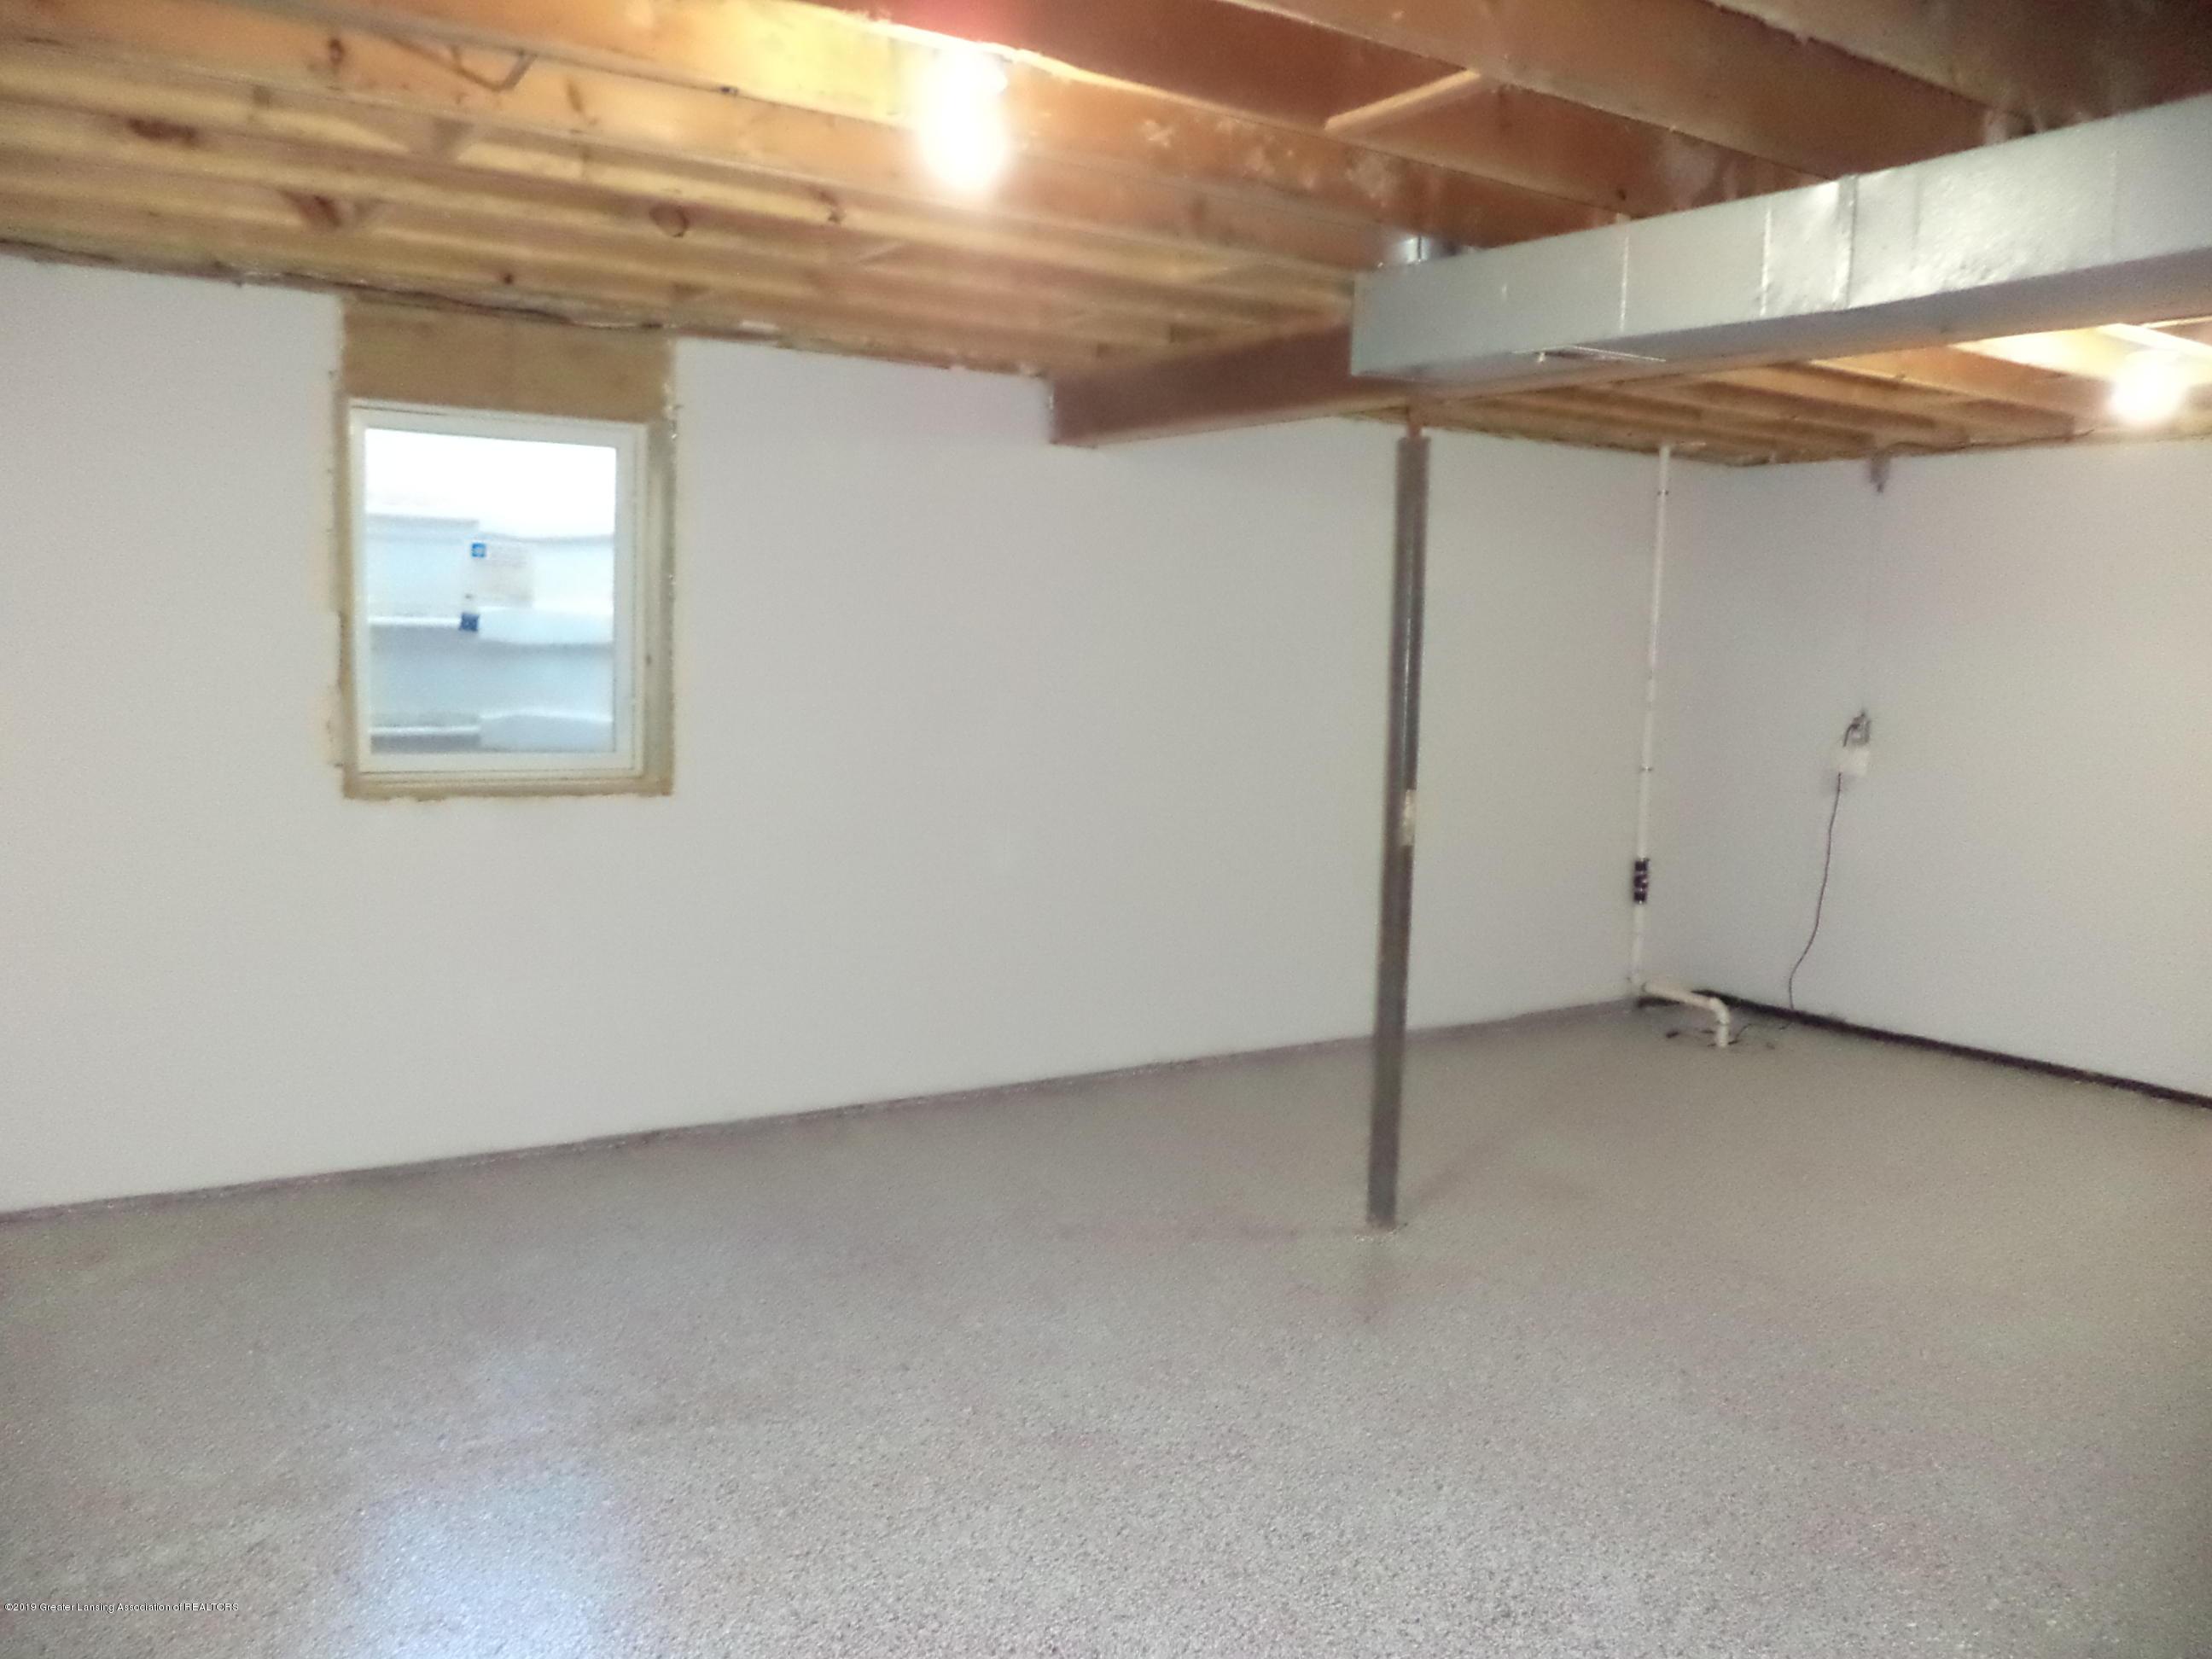 3200 S Dewitt Rd - Lower level egress window - 30